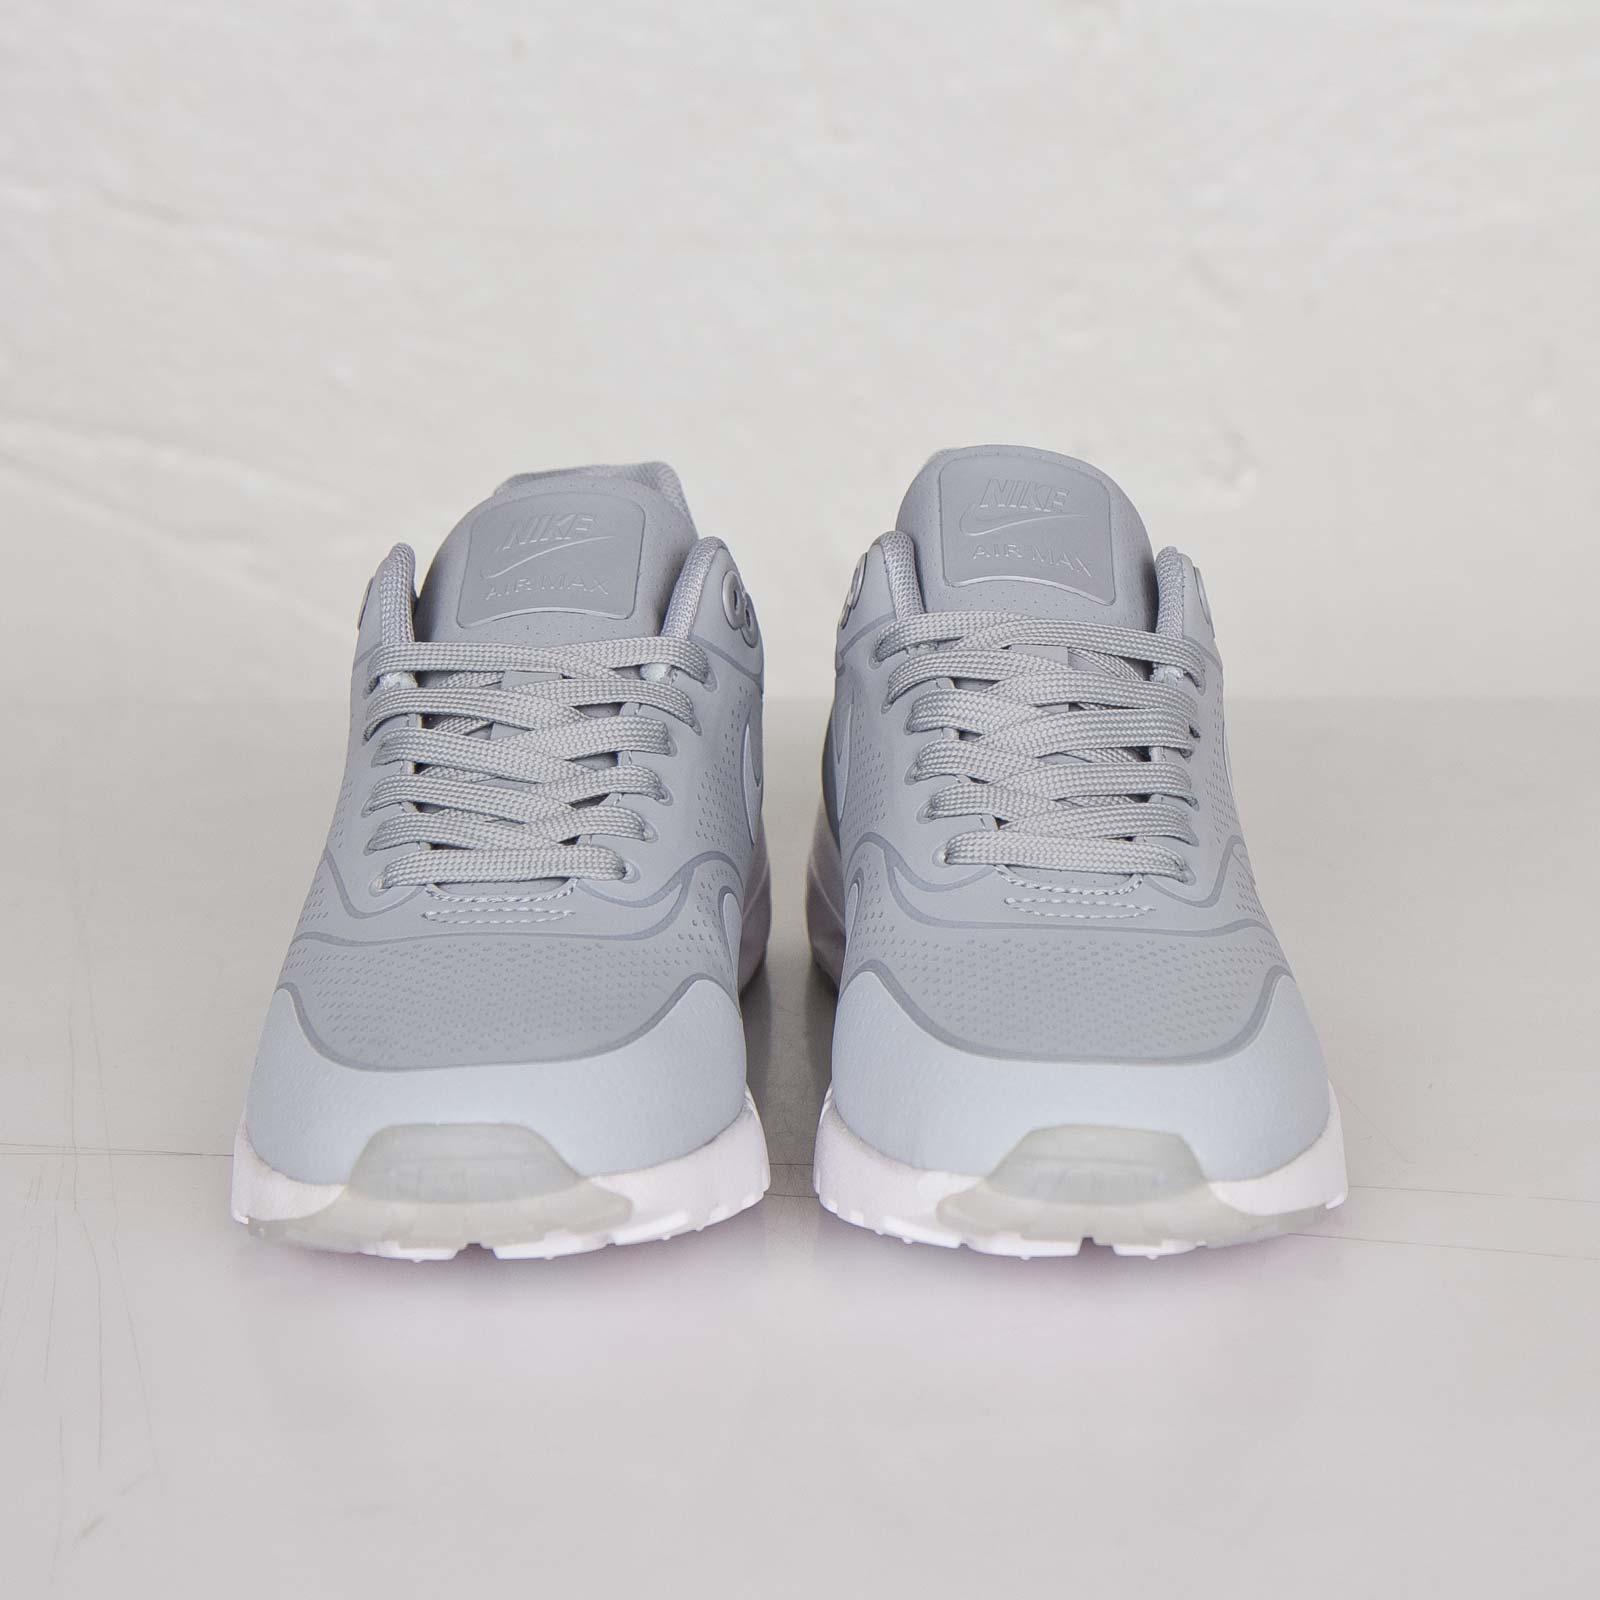 online store 91d84 8432d ... Nike Wmns Air Max 1 Ultra Moire ...